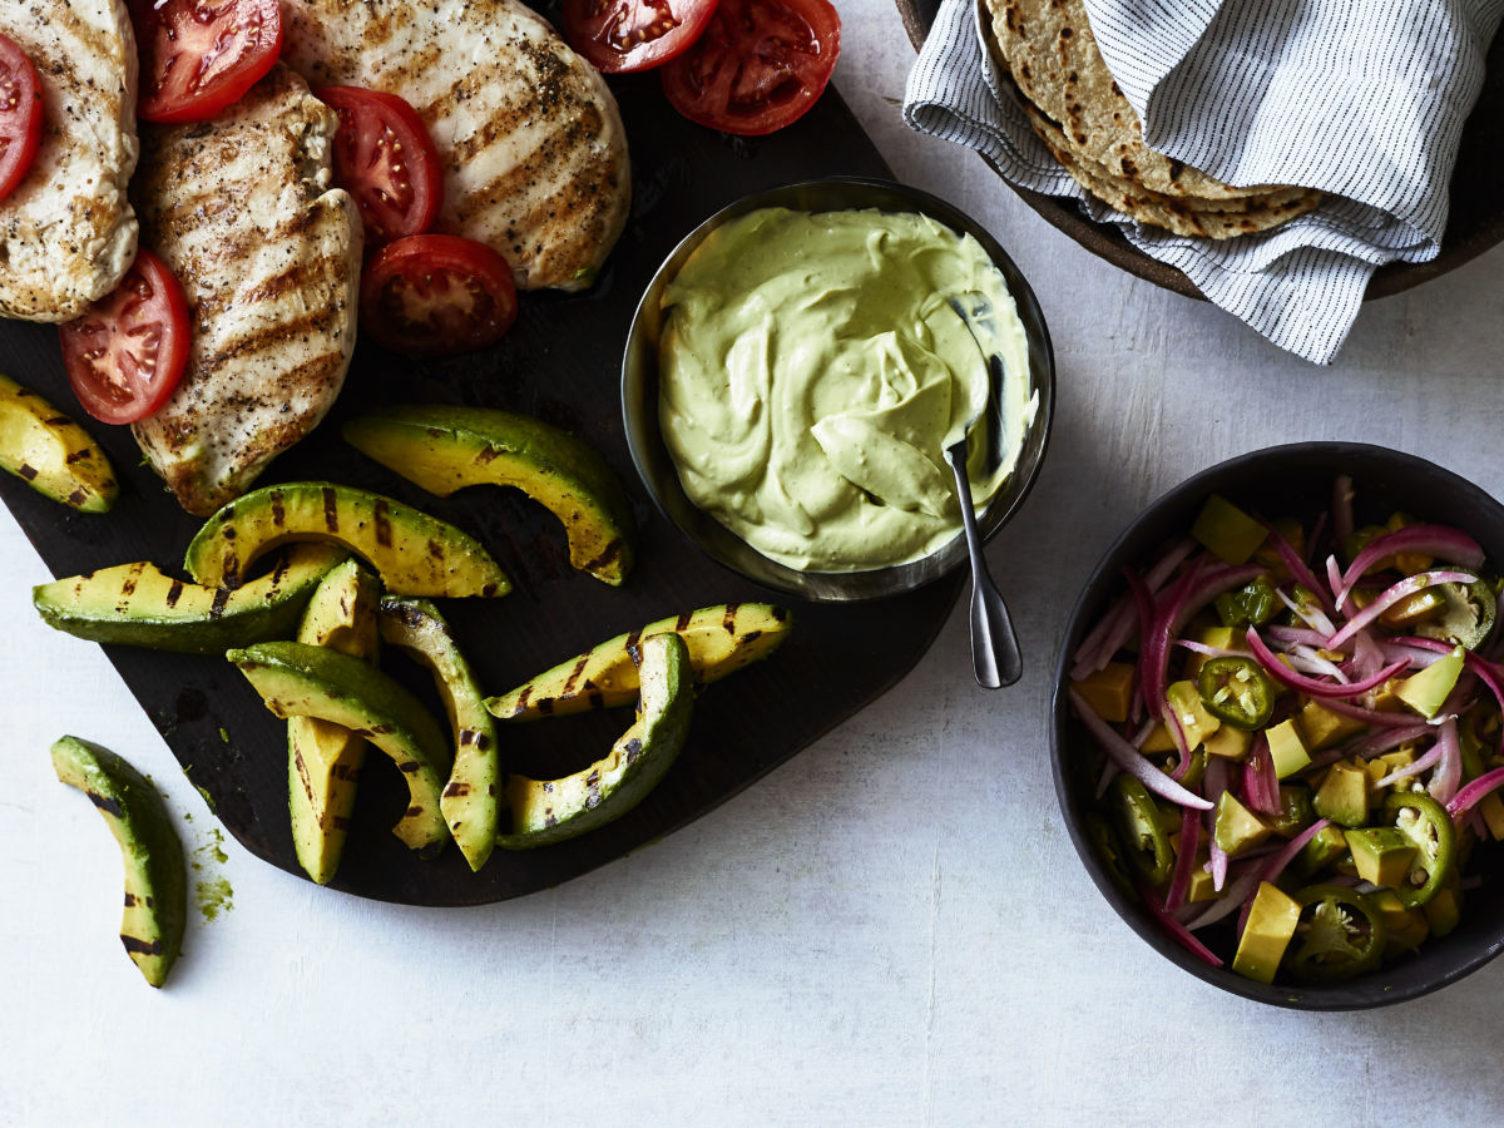 Grilled Chicken with Avocado Three Ways